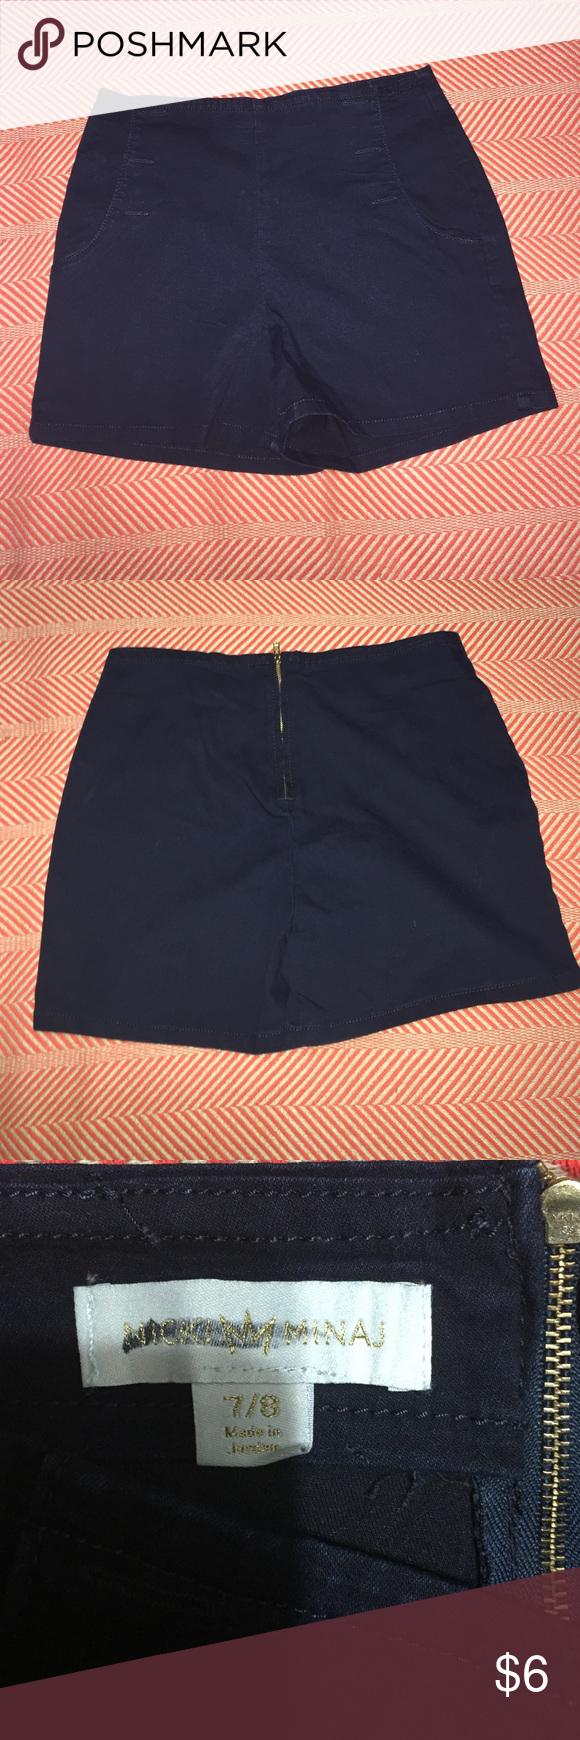 Nicki Minaj high waisted shorts New but without tag! Perfect for summer Nicki Minaj Shorts Jean Shorts